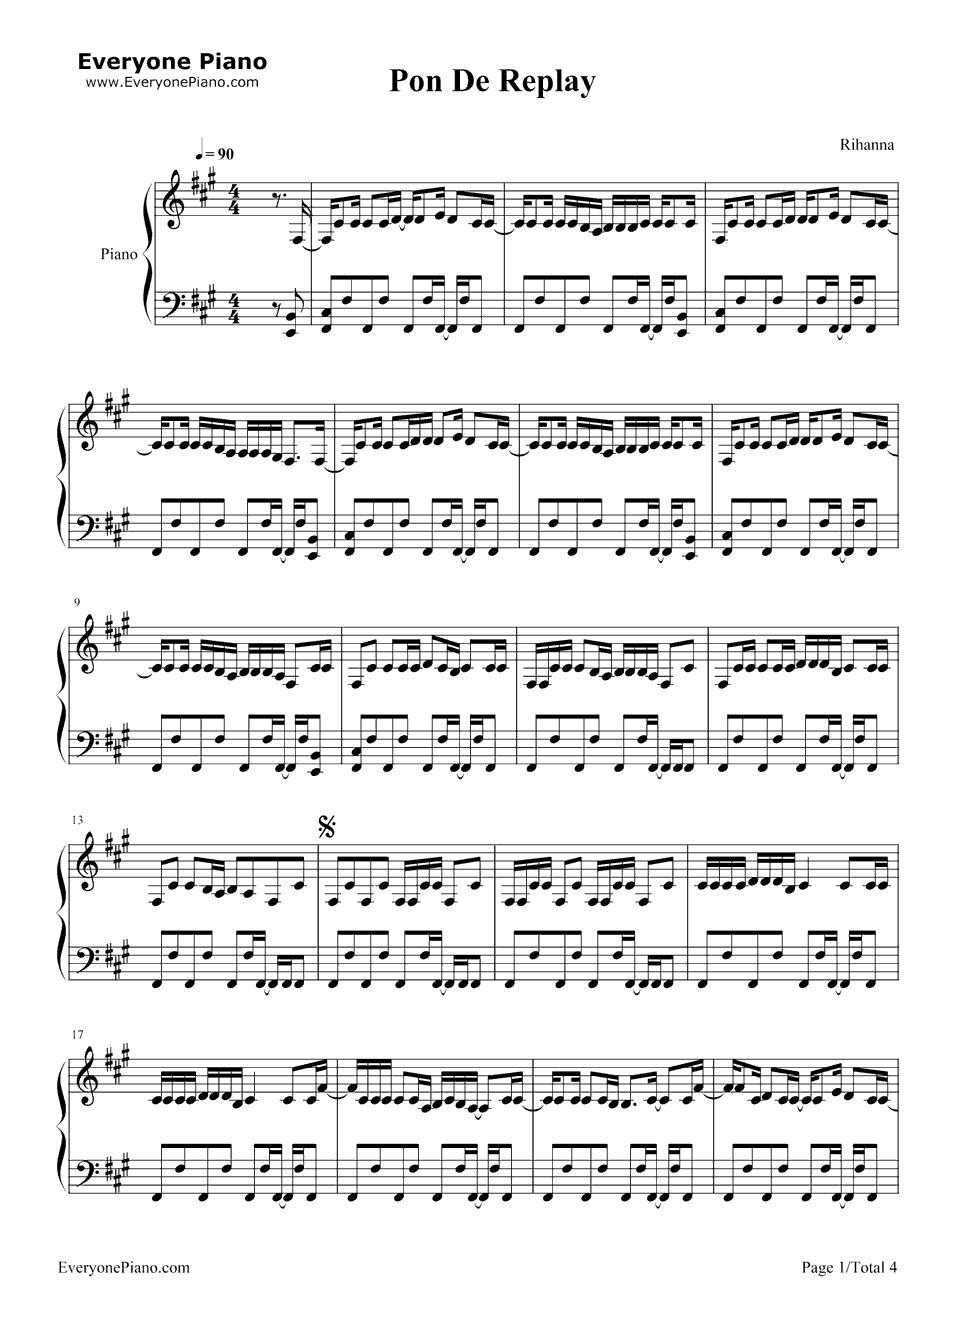 Pon de replay rihanna stave preview 1 free piano sheet music listen now print sheet pon de replay rihanna stave preview 1 hexwebz Image collections